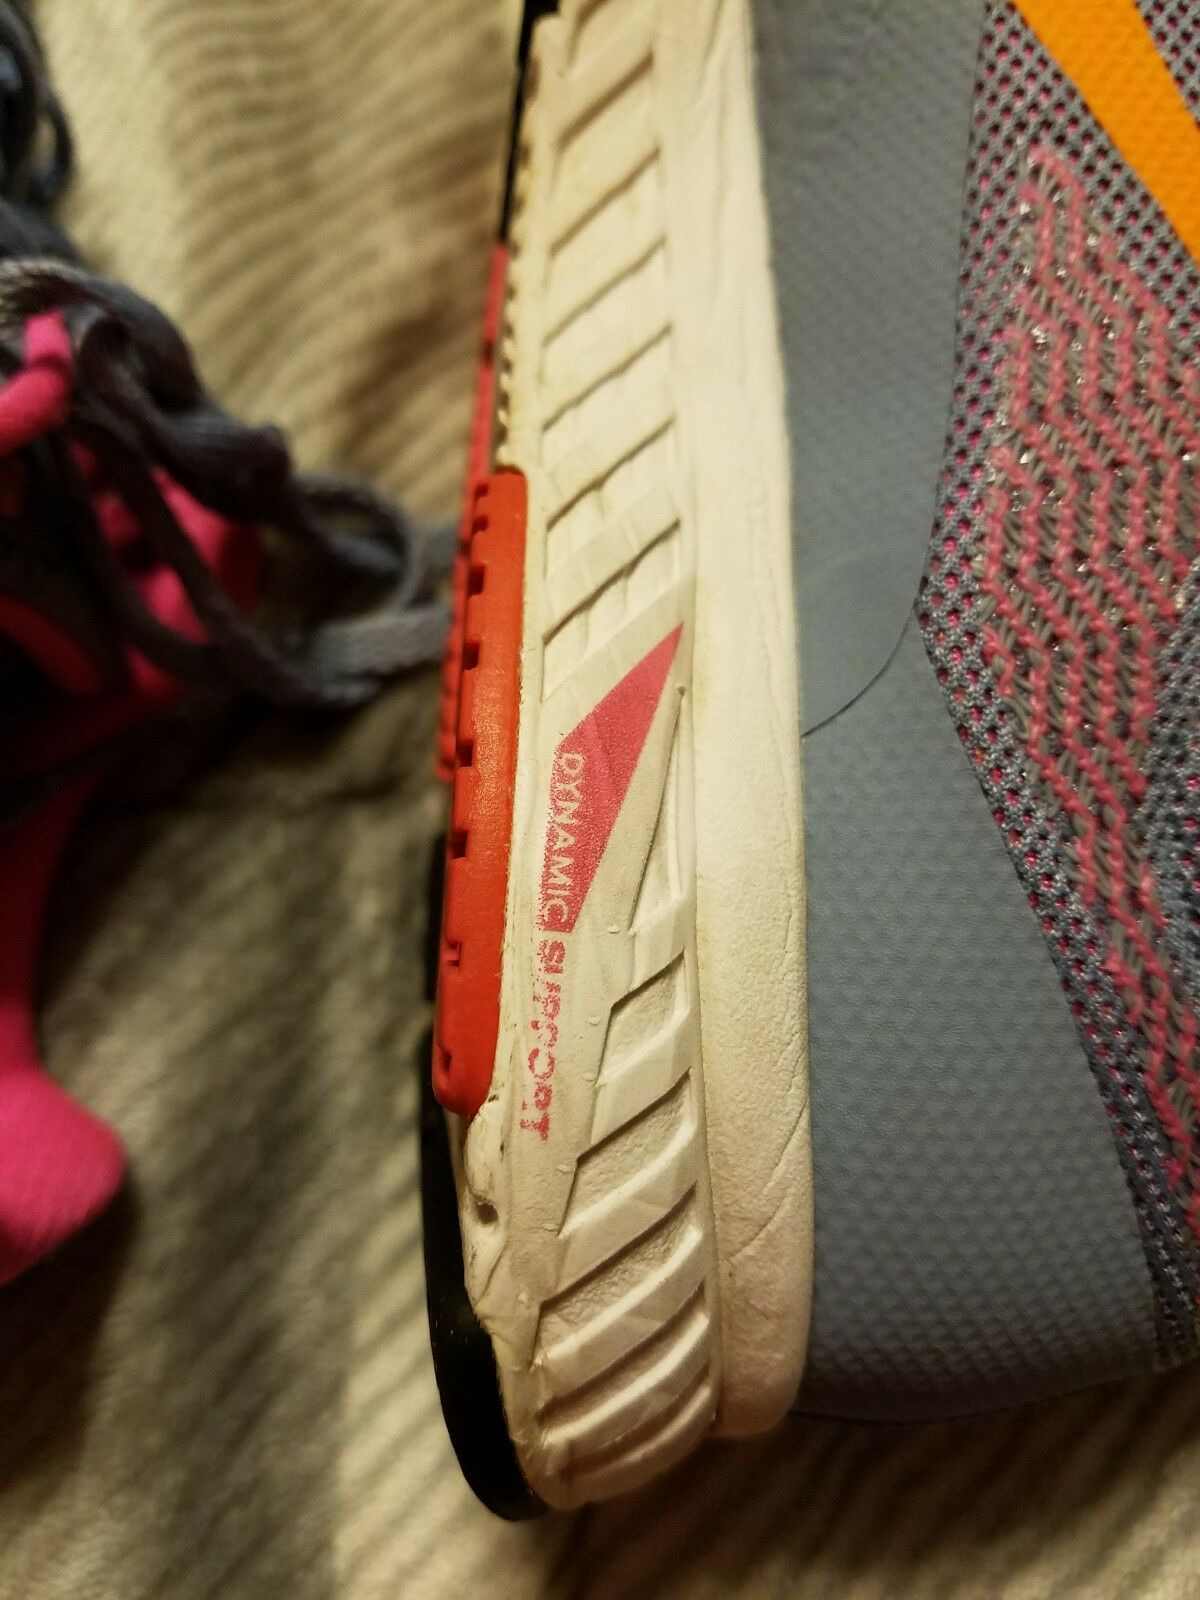 nike air zoom mosca mosca mosca 2 le scarpe da corsa 707607-403 dimensioni 6 | Di Rango Primo Tra Prodotti Simili  | vendita all'asta  | Maschio/Ragazze Scarpa  | Sig/Sig Ra Scarpa  ca5be7